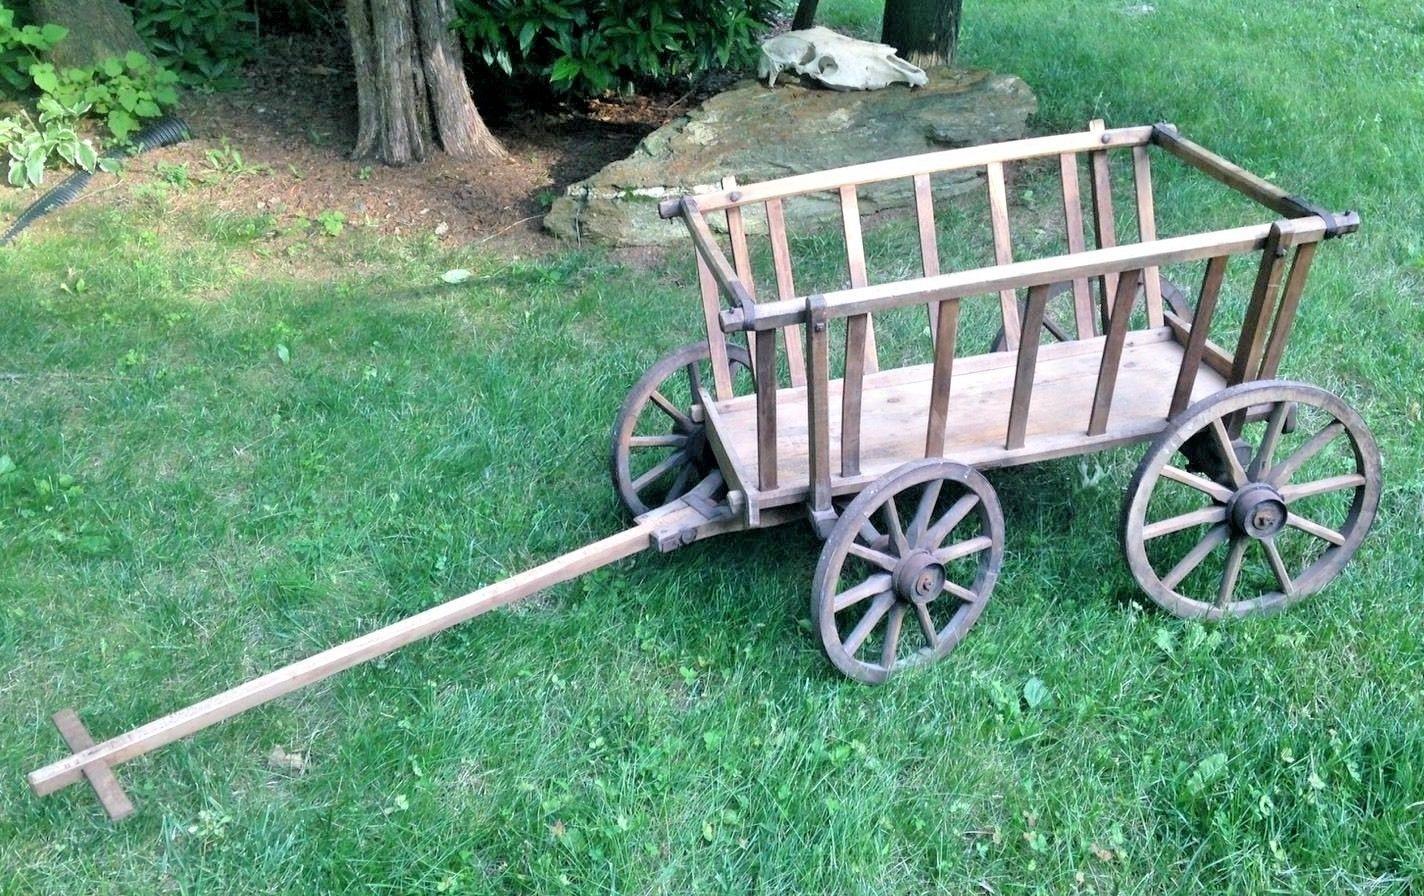 wagons carts inch garden supply wheels medium yard cart with gardening